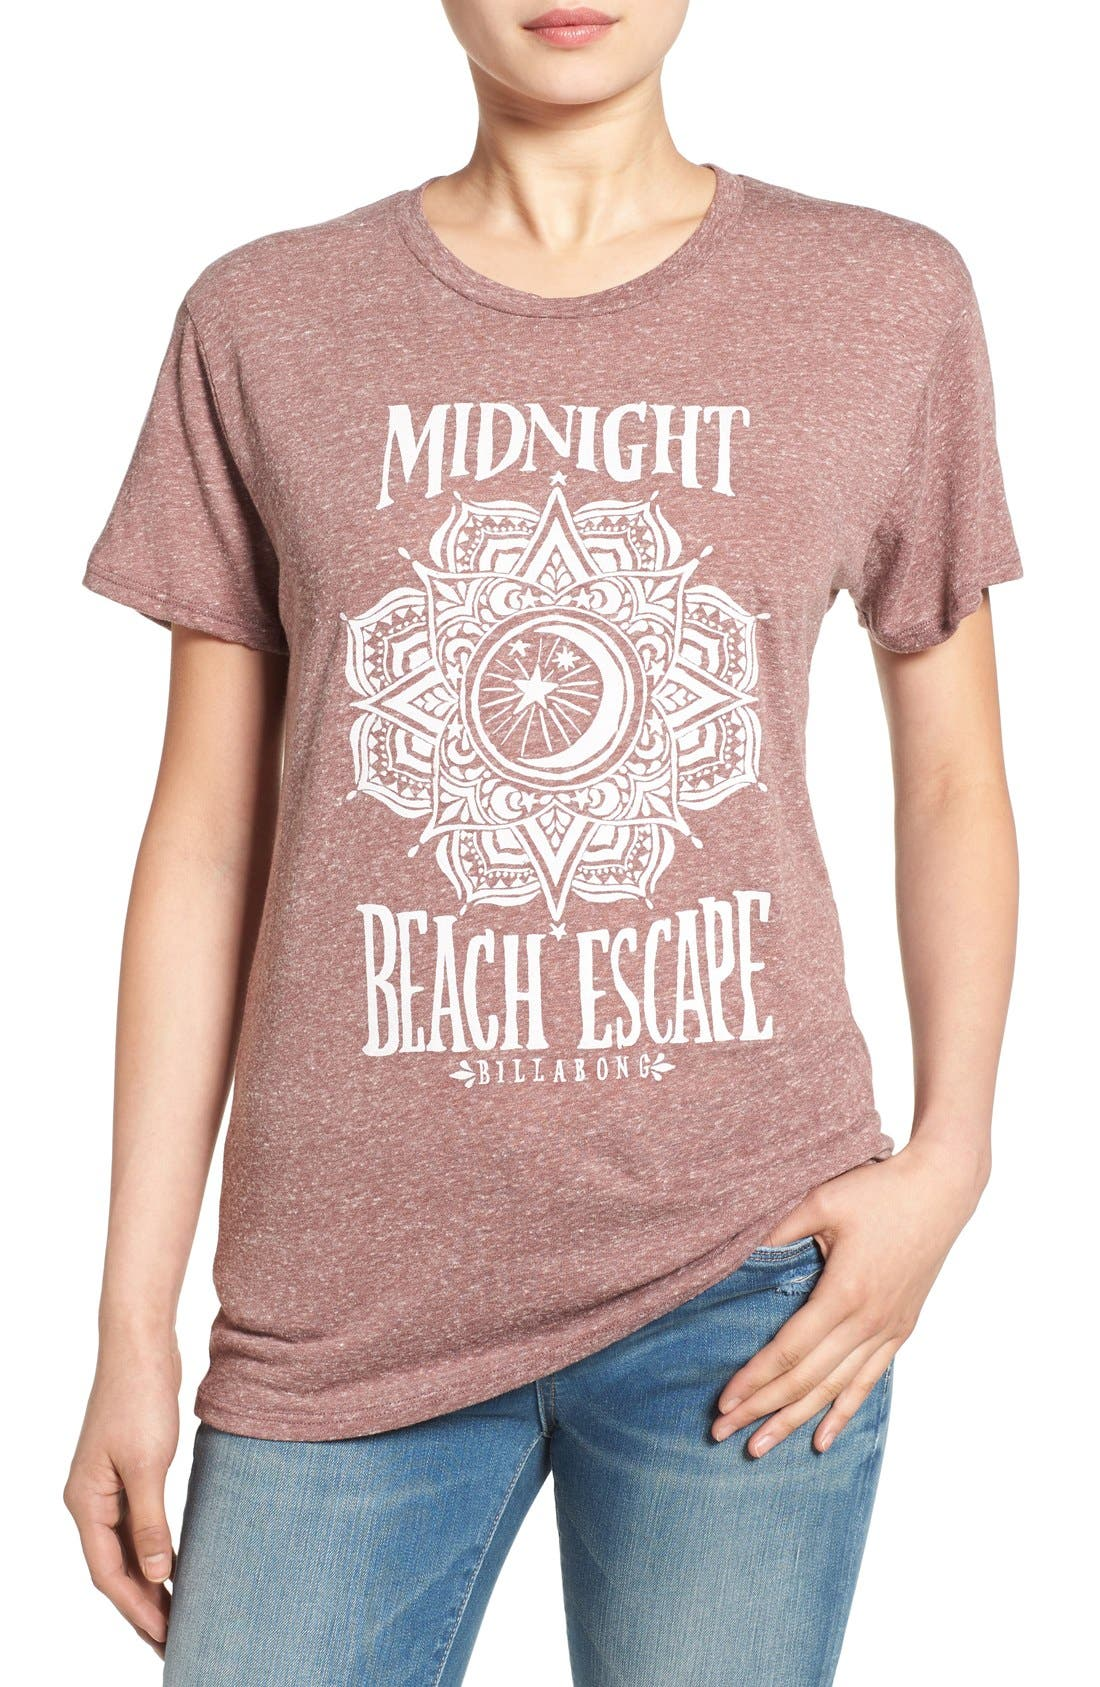 Main Image - Billabong 'Midnight Escape' Graphic Tee